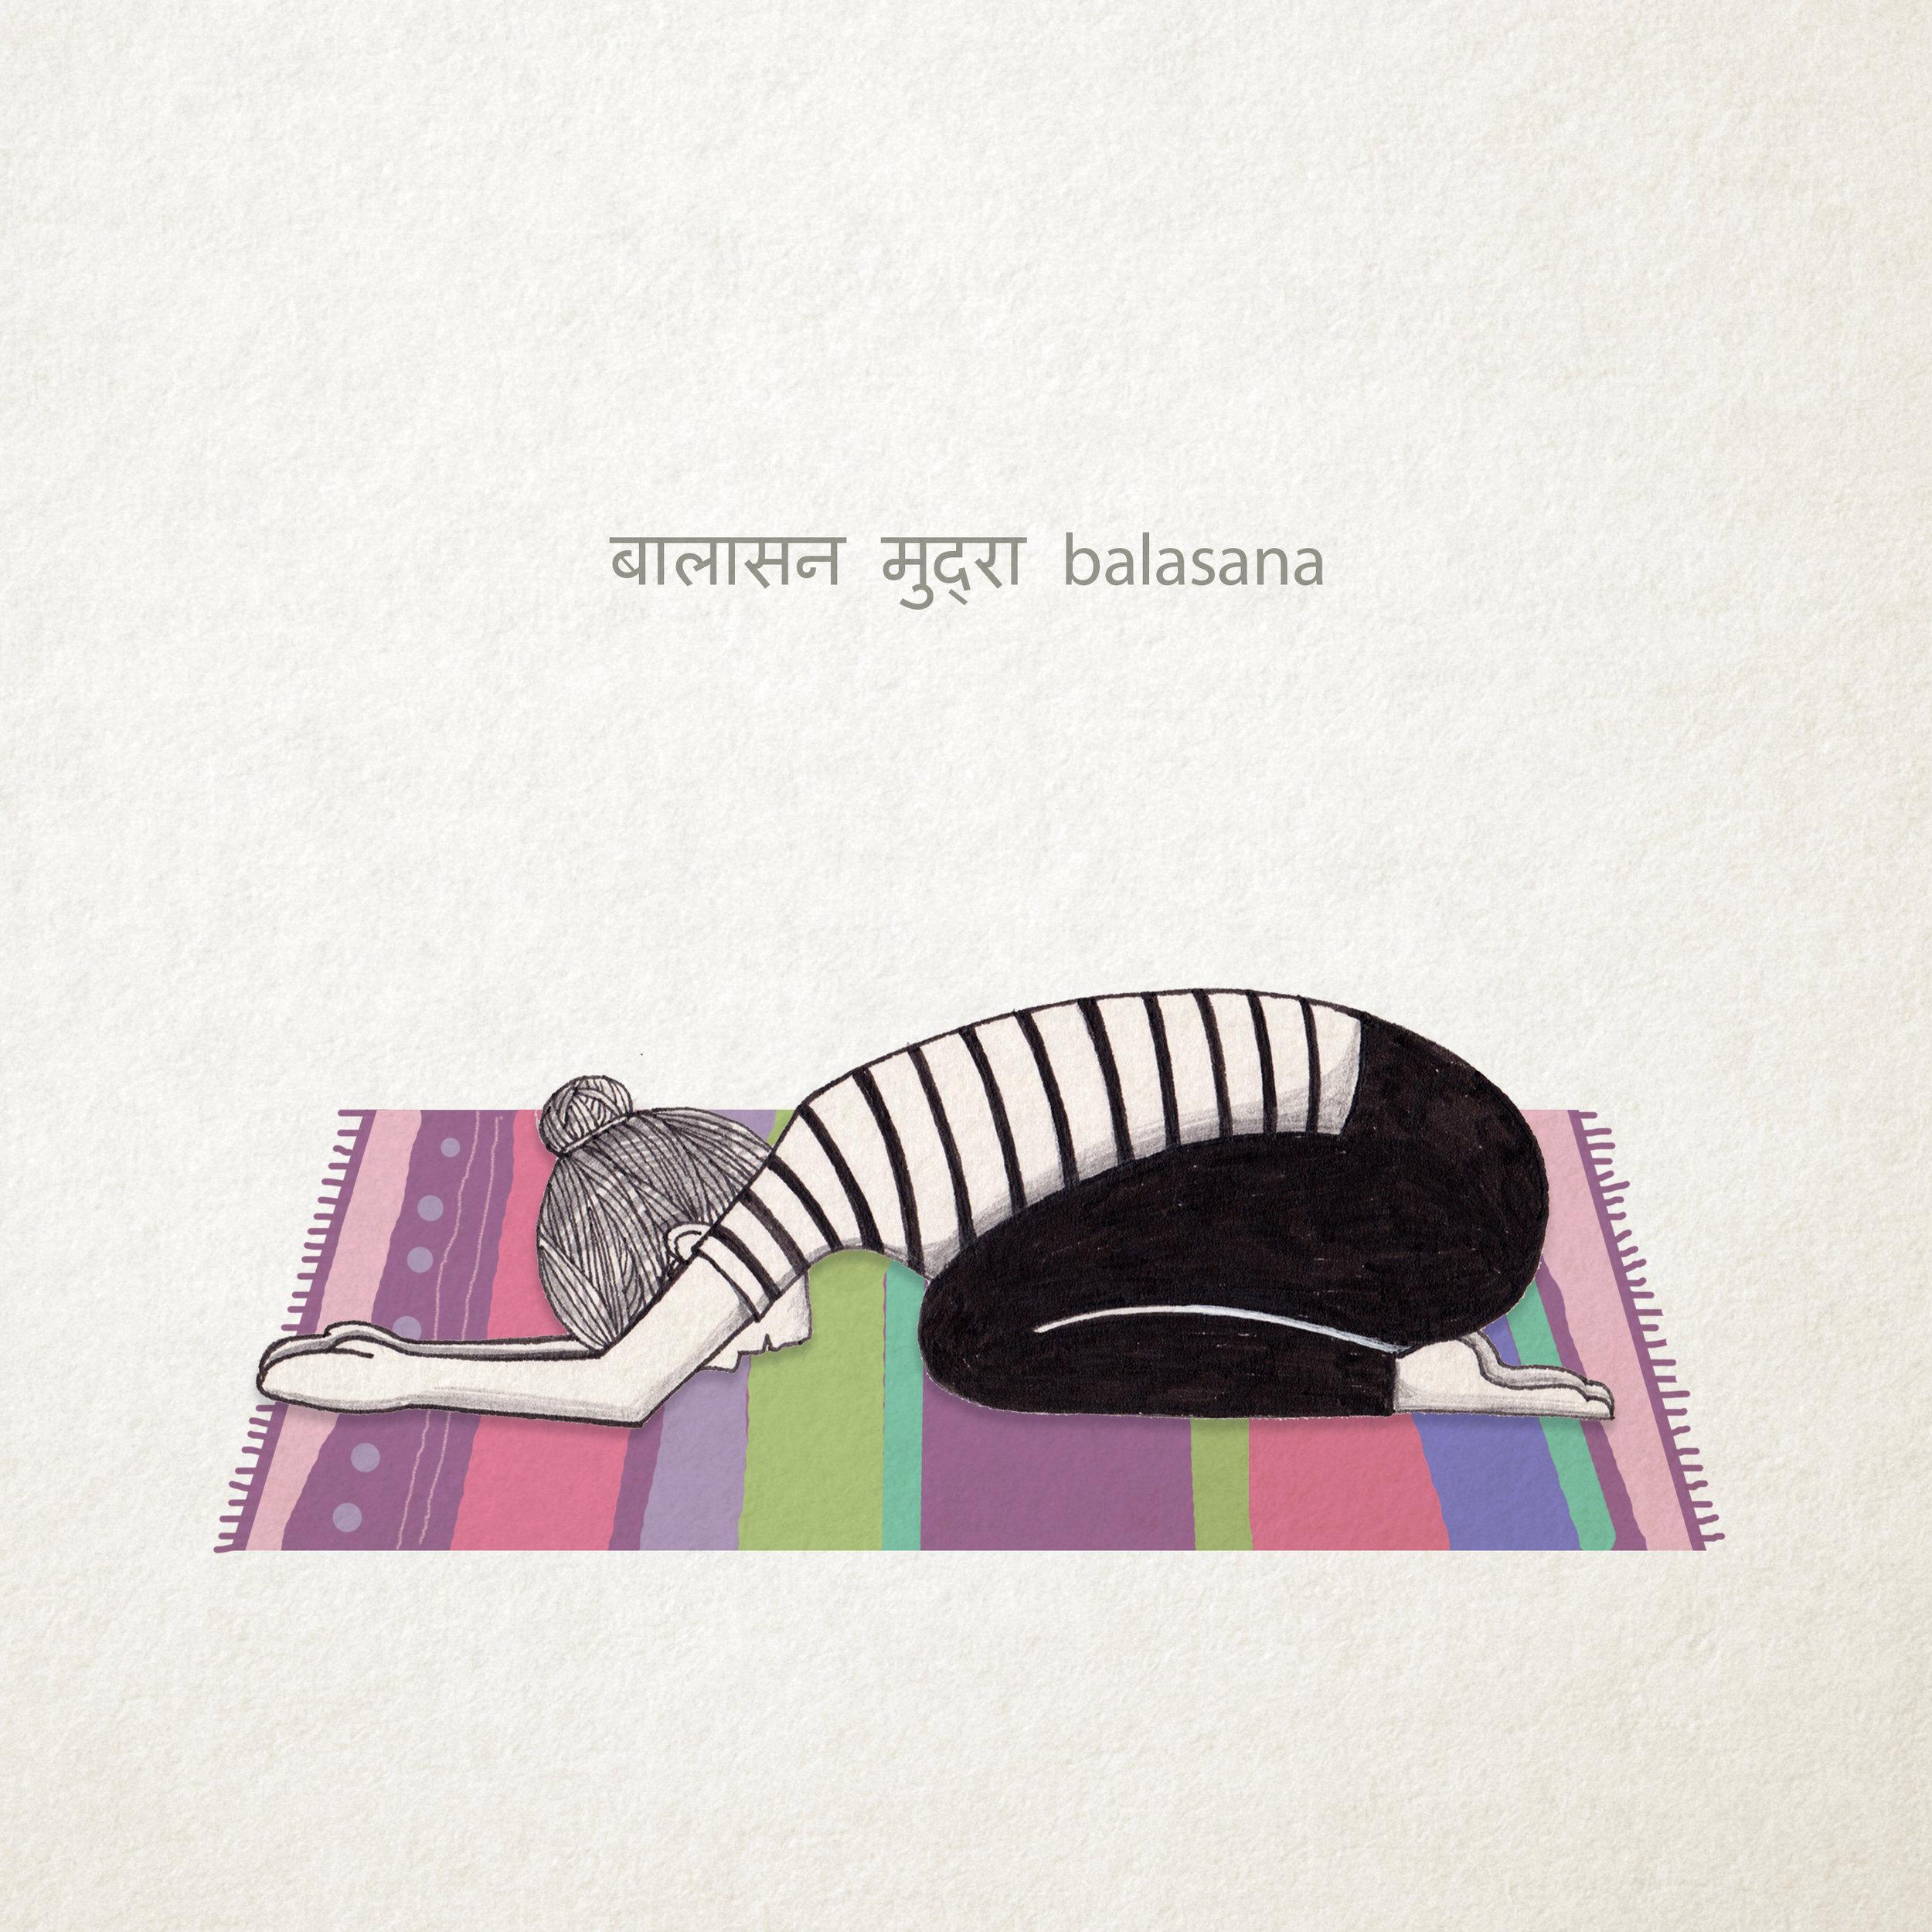 Balasana - Child's Pose